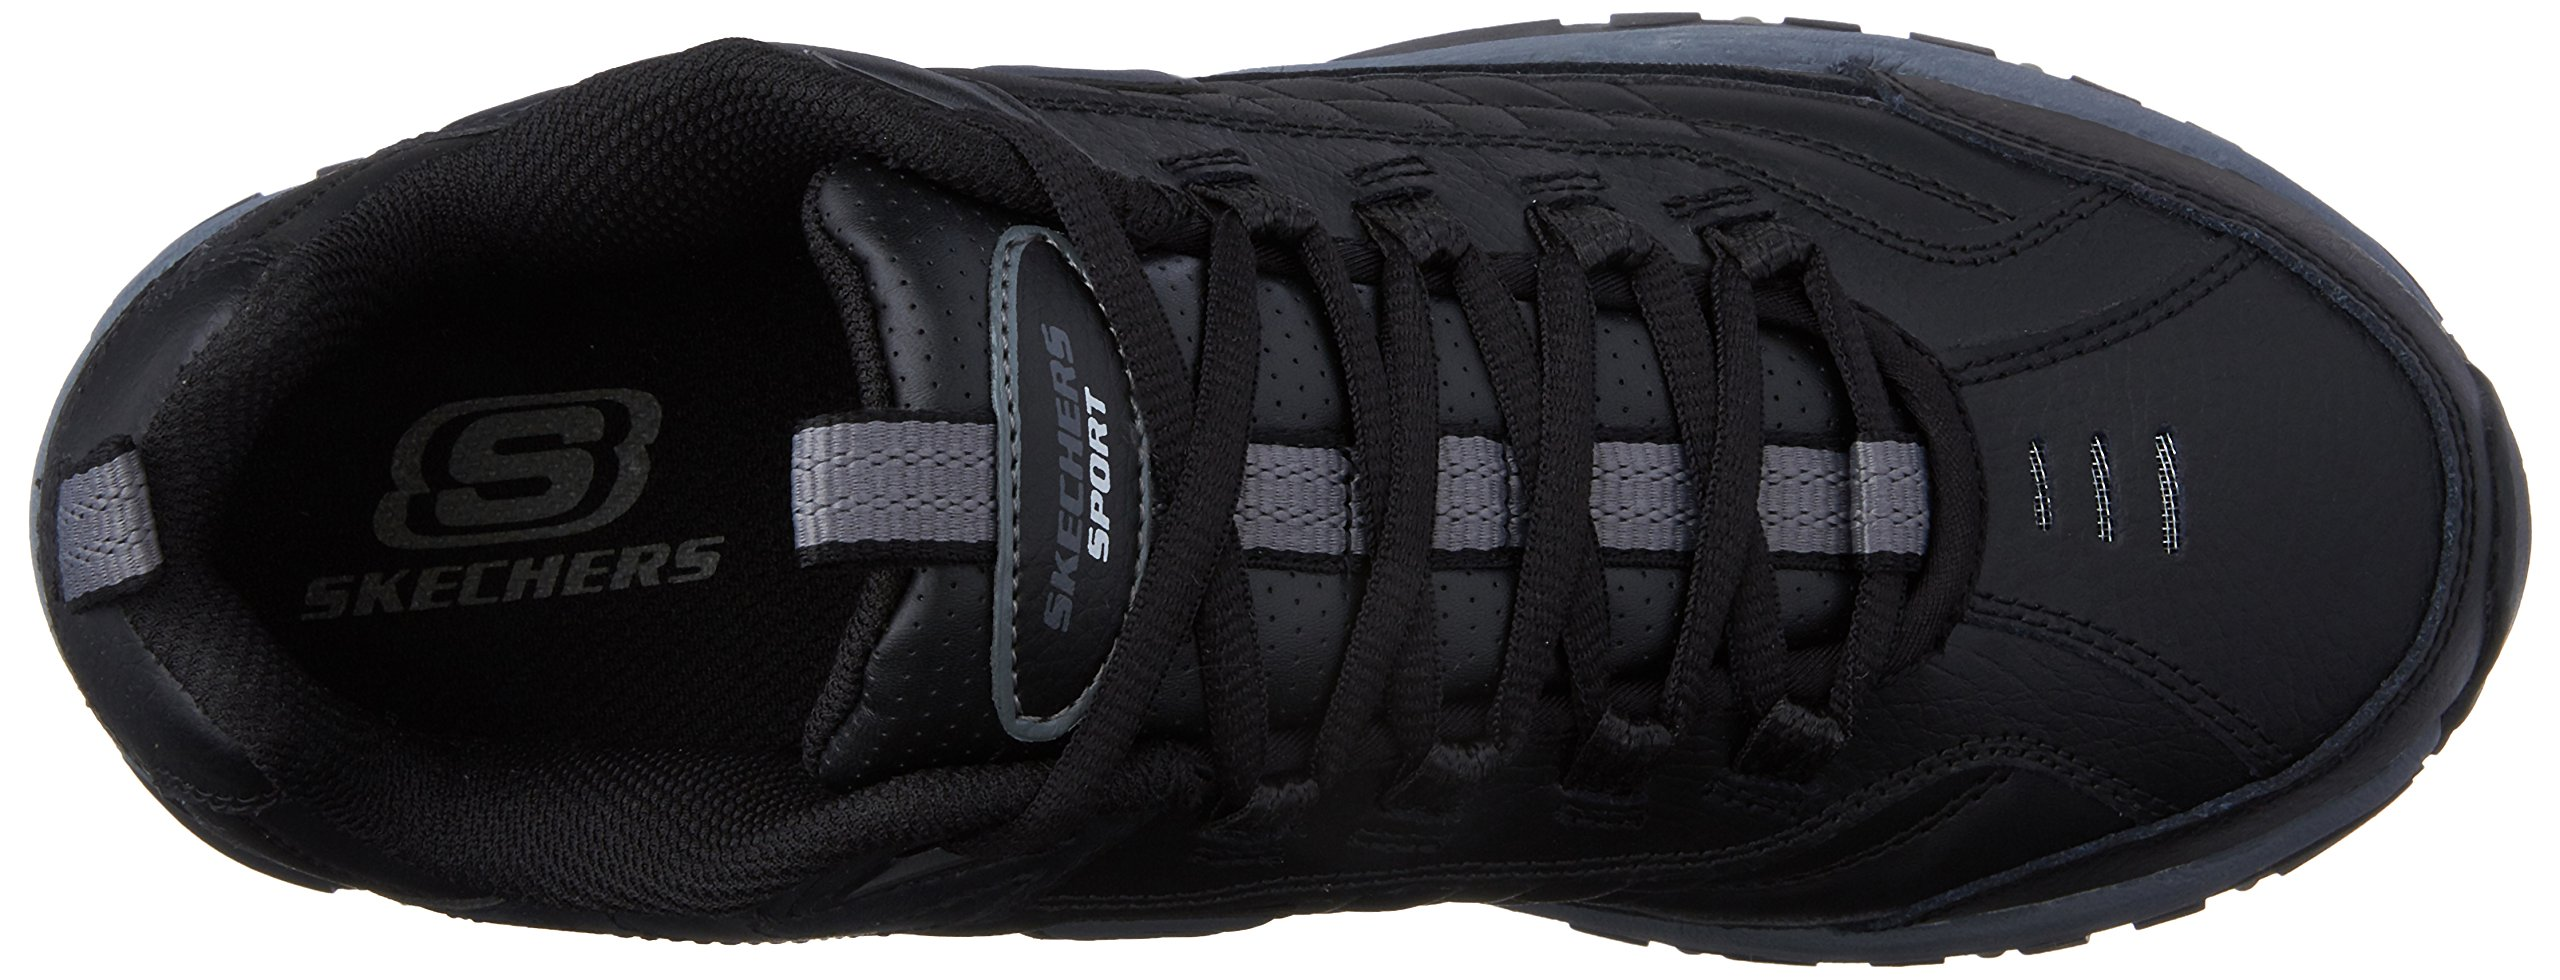 Skechers Men's Energy Afterburn Lace-Up Sneaker,Black/Gray,14 M US by Skechers (Image #8)